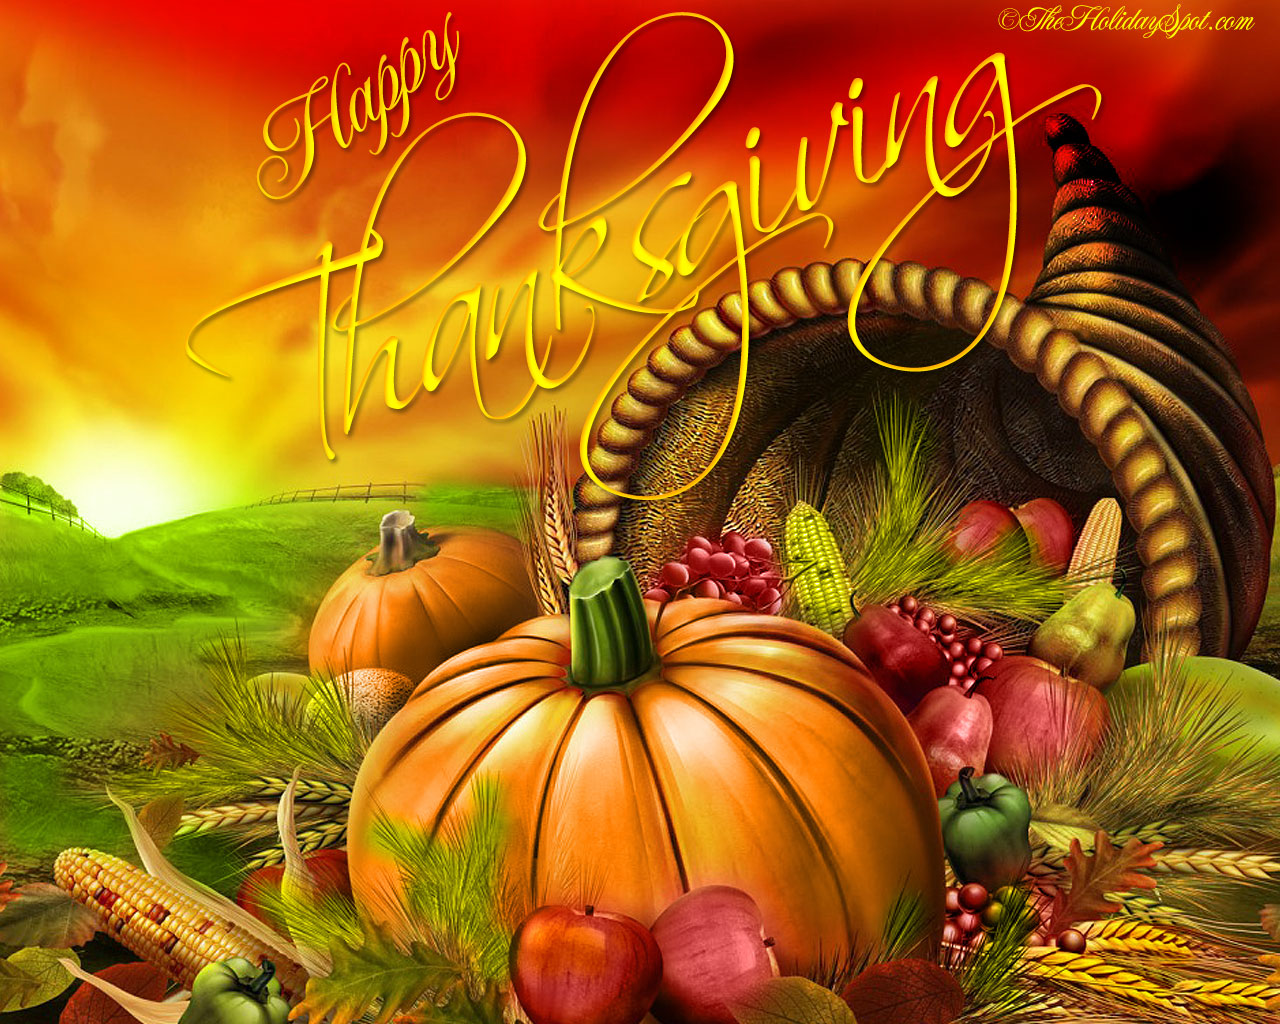 happy thanksgiving - photo #21